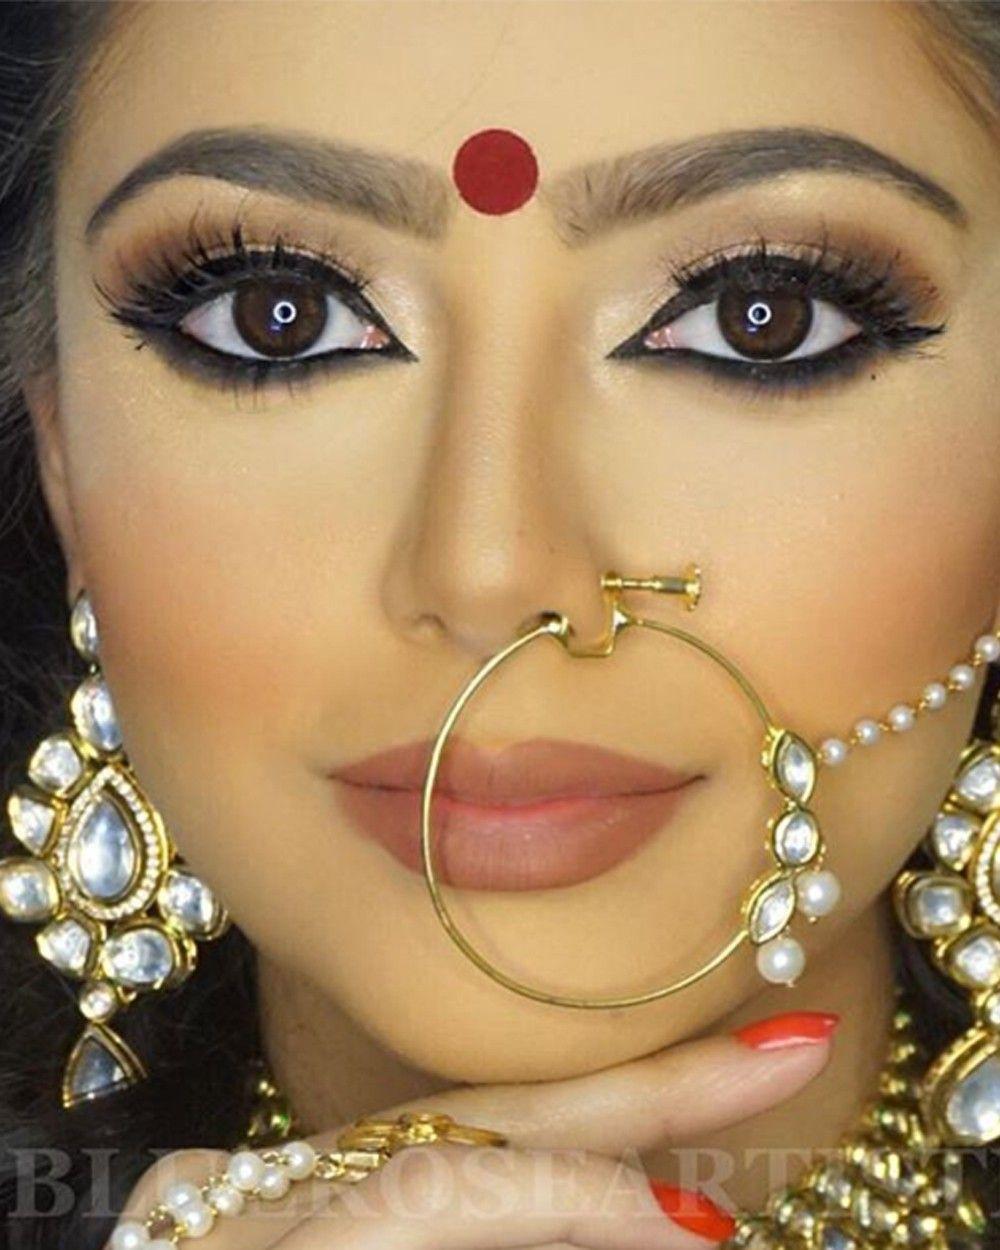 Ameena Nose Ring - Nose Rings - Jewelery | awards ball | Pinterest ...